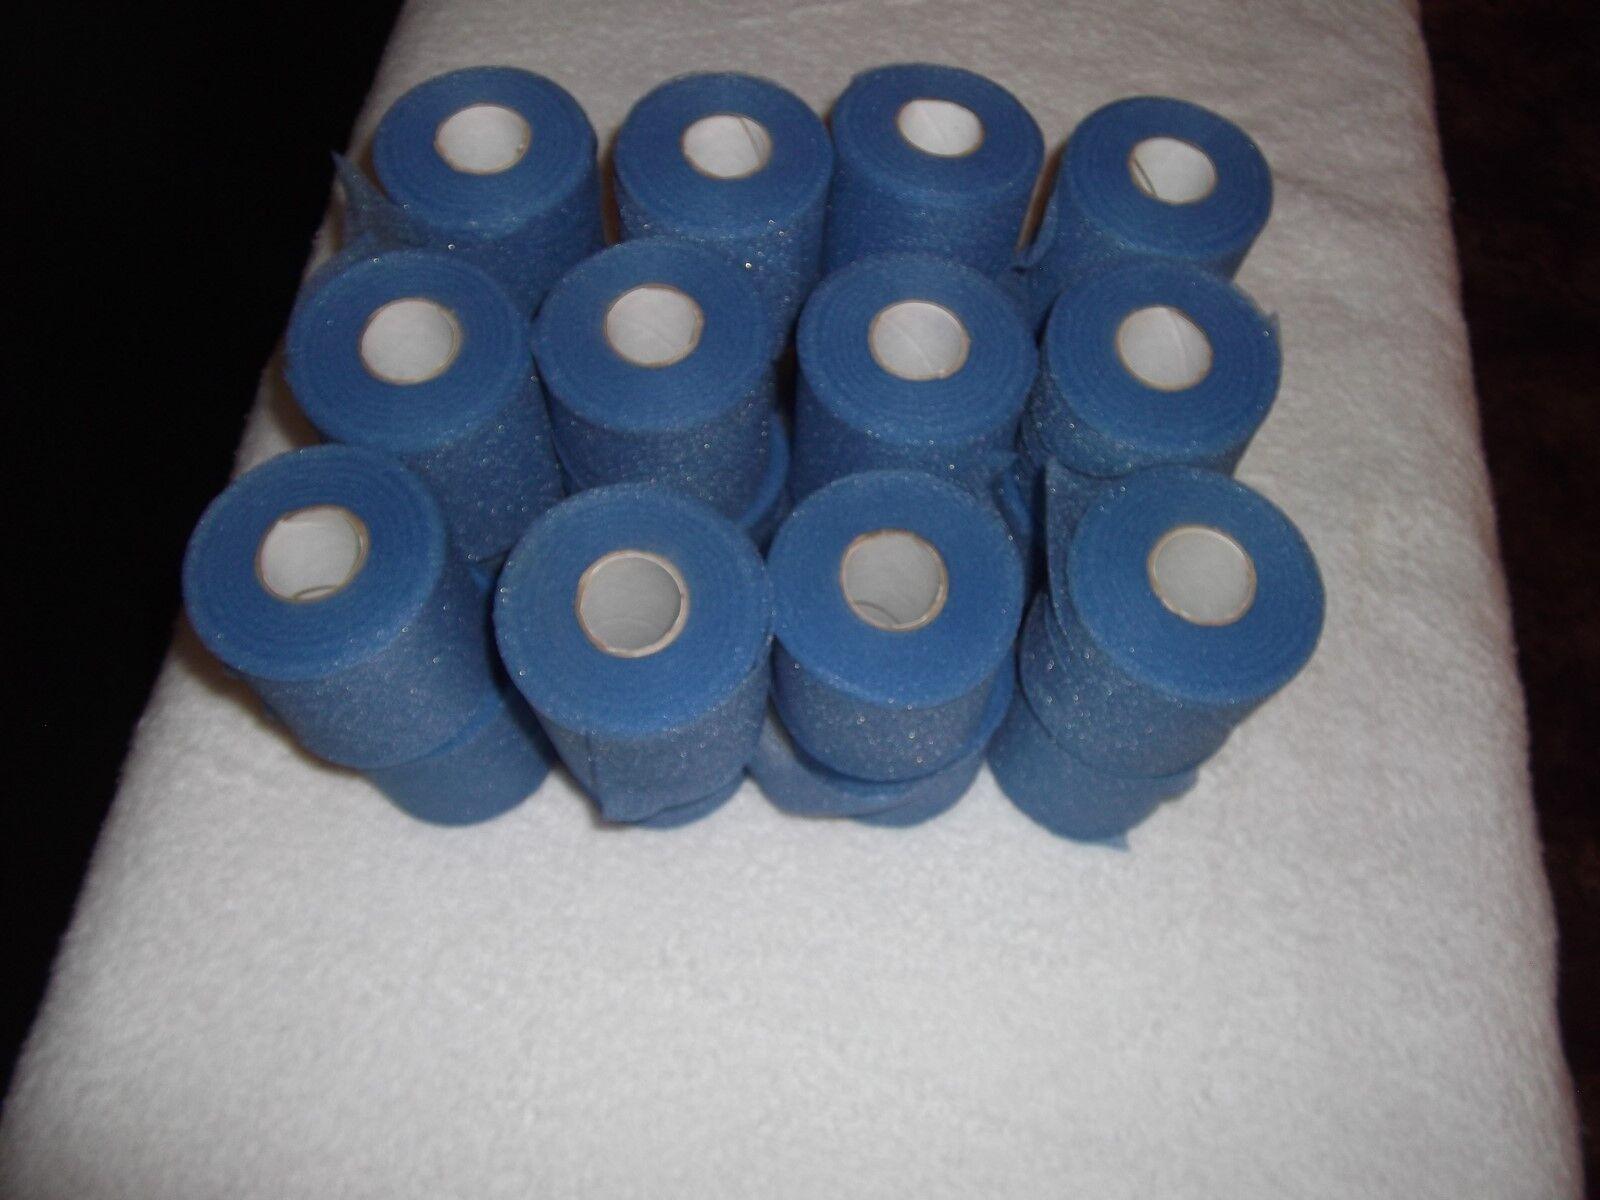 Azul Correr pre-Wrap 96 rollos de 2 34 x30yds.